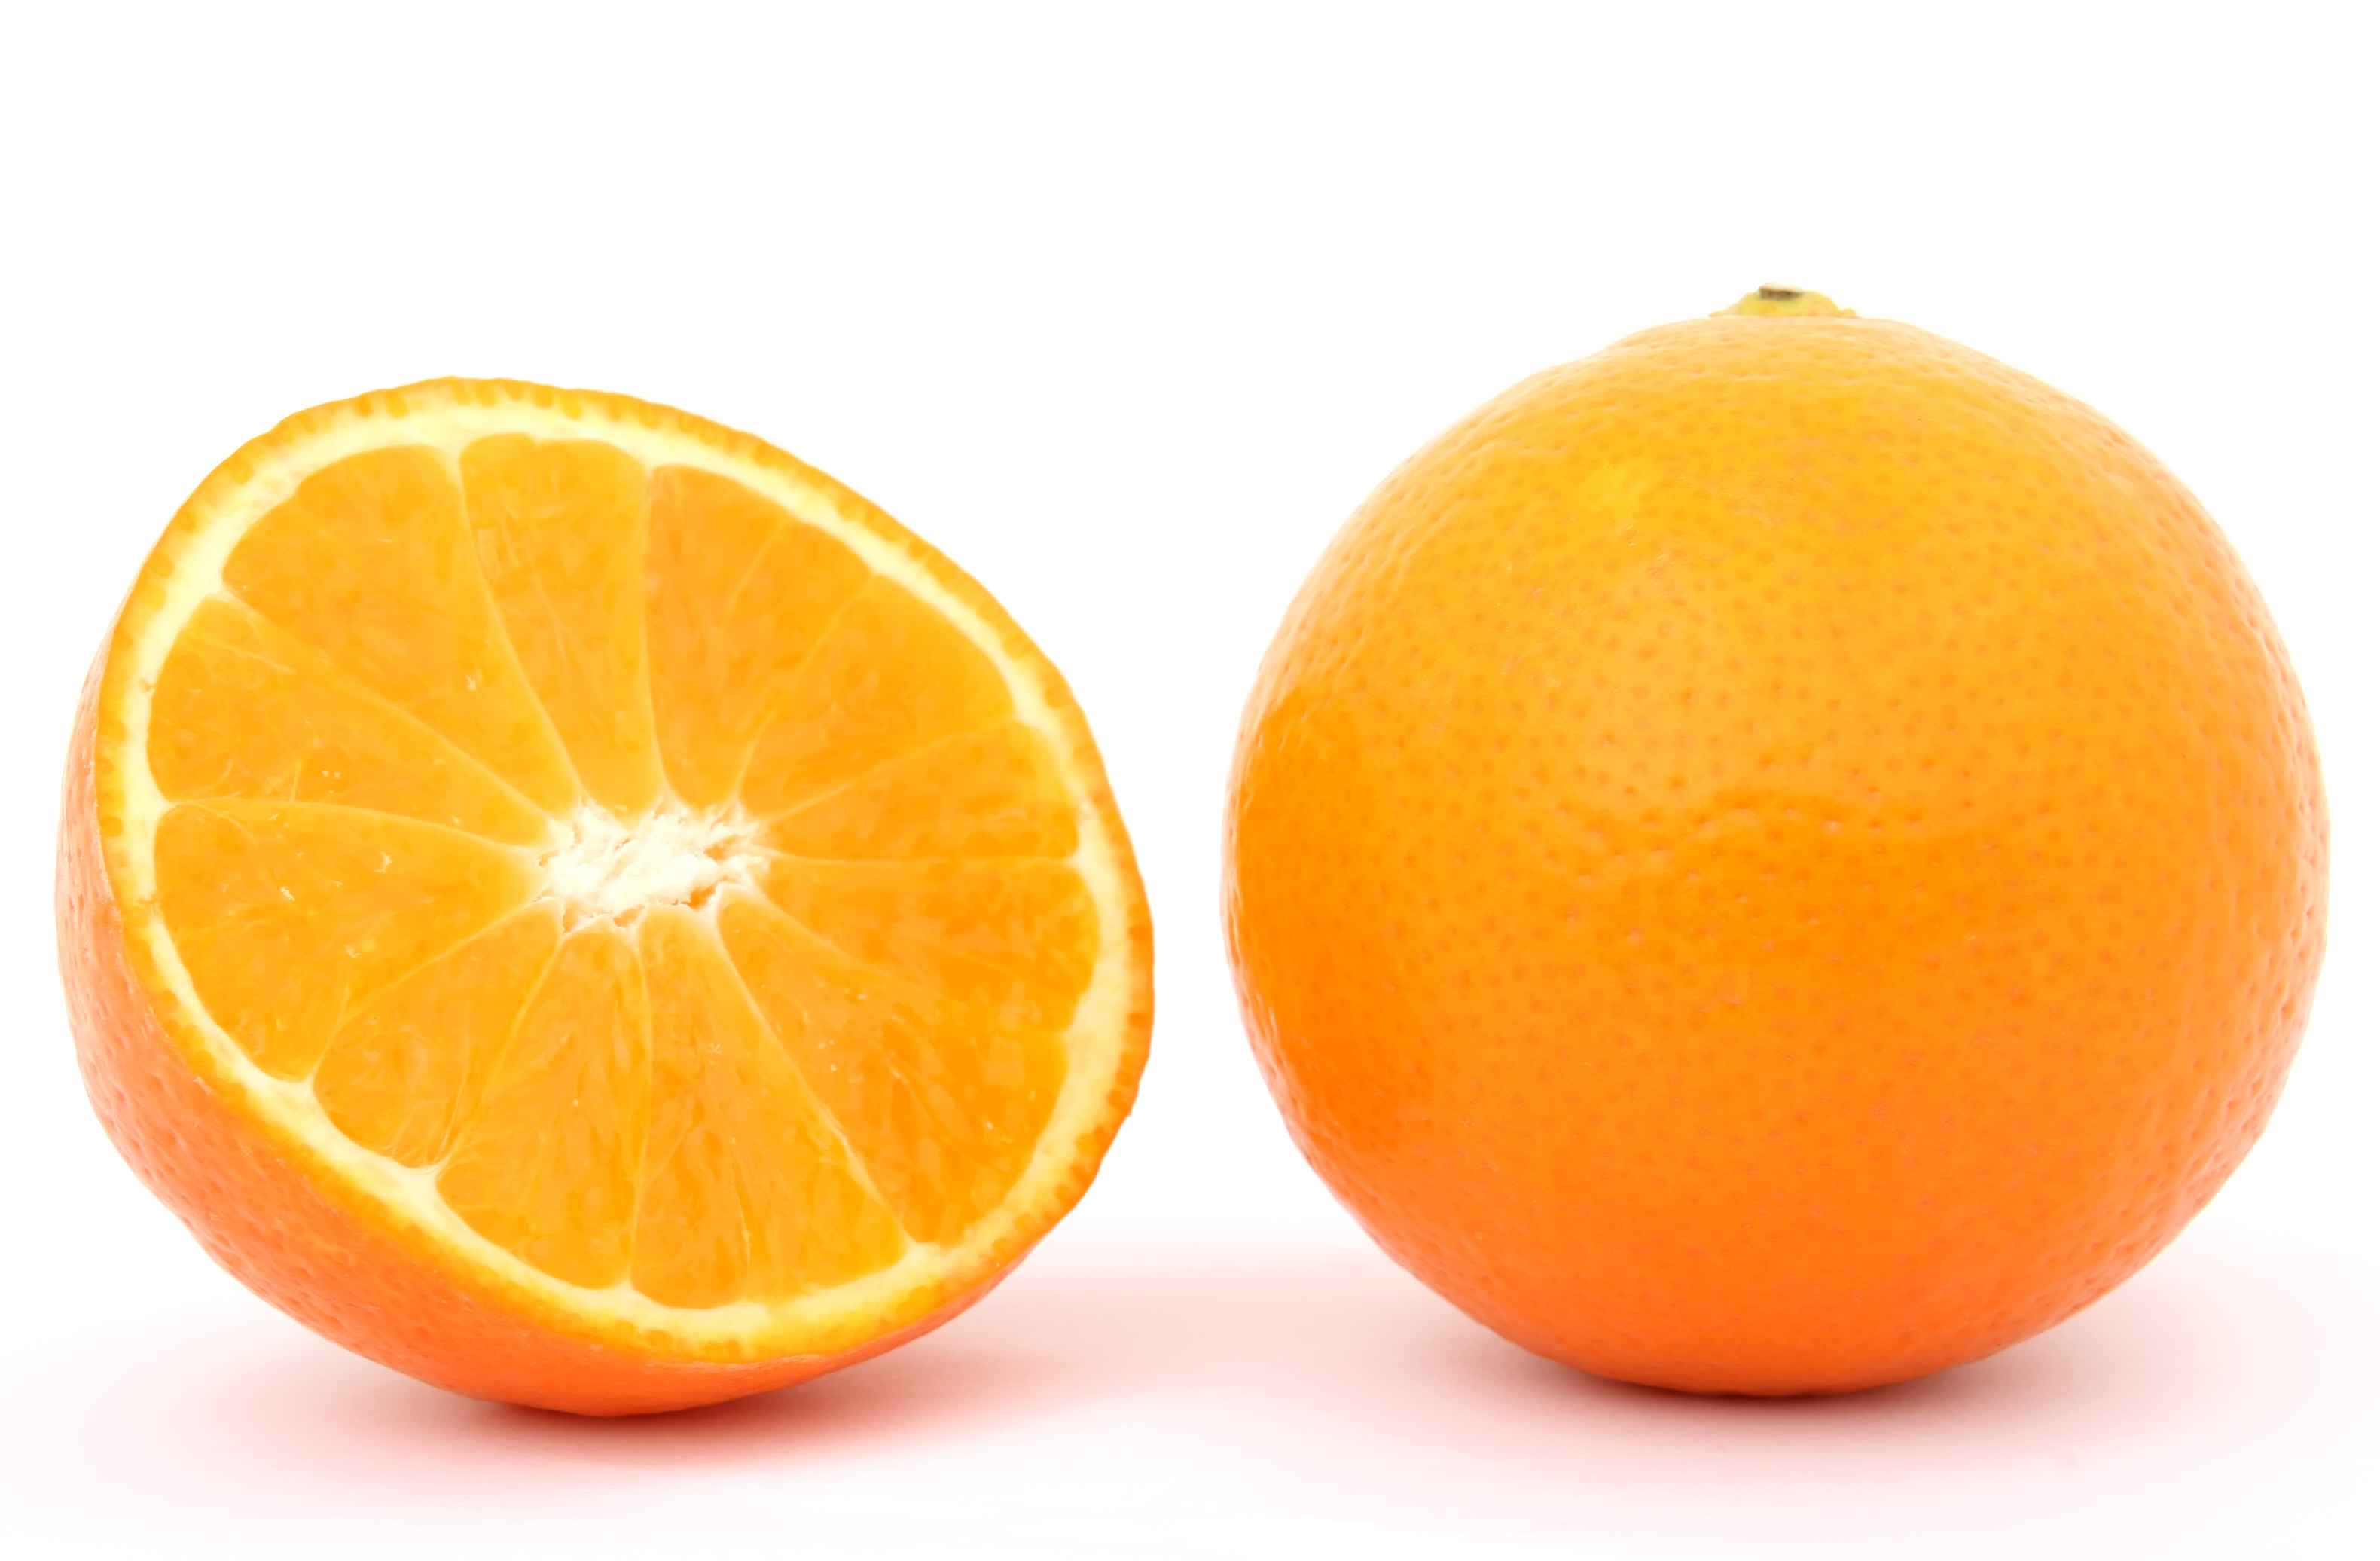 Orange images Orange Fruit HD wallpaper and background photos 3160x2072